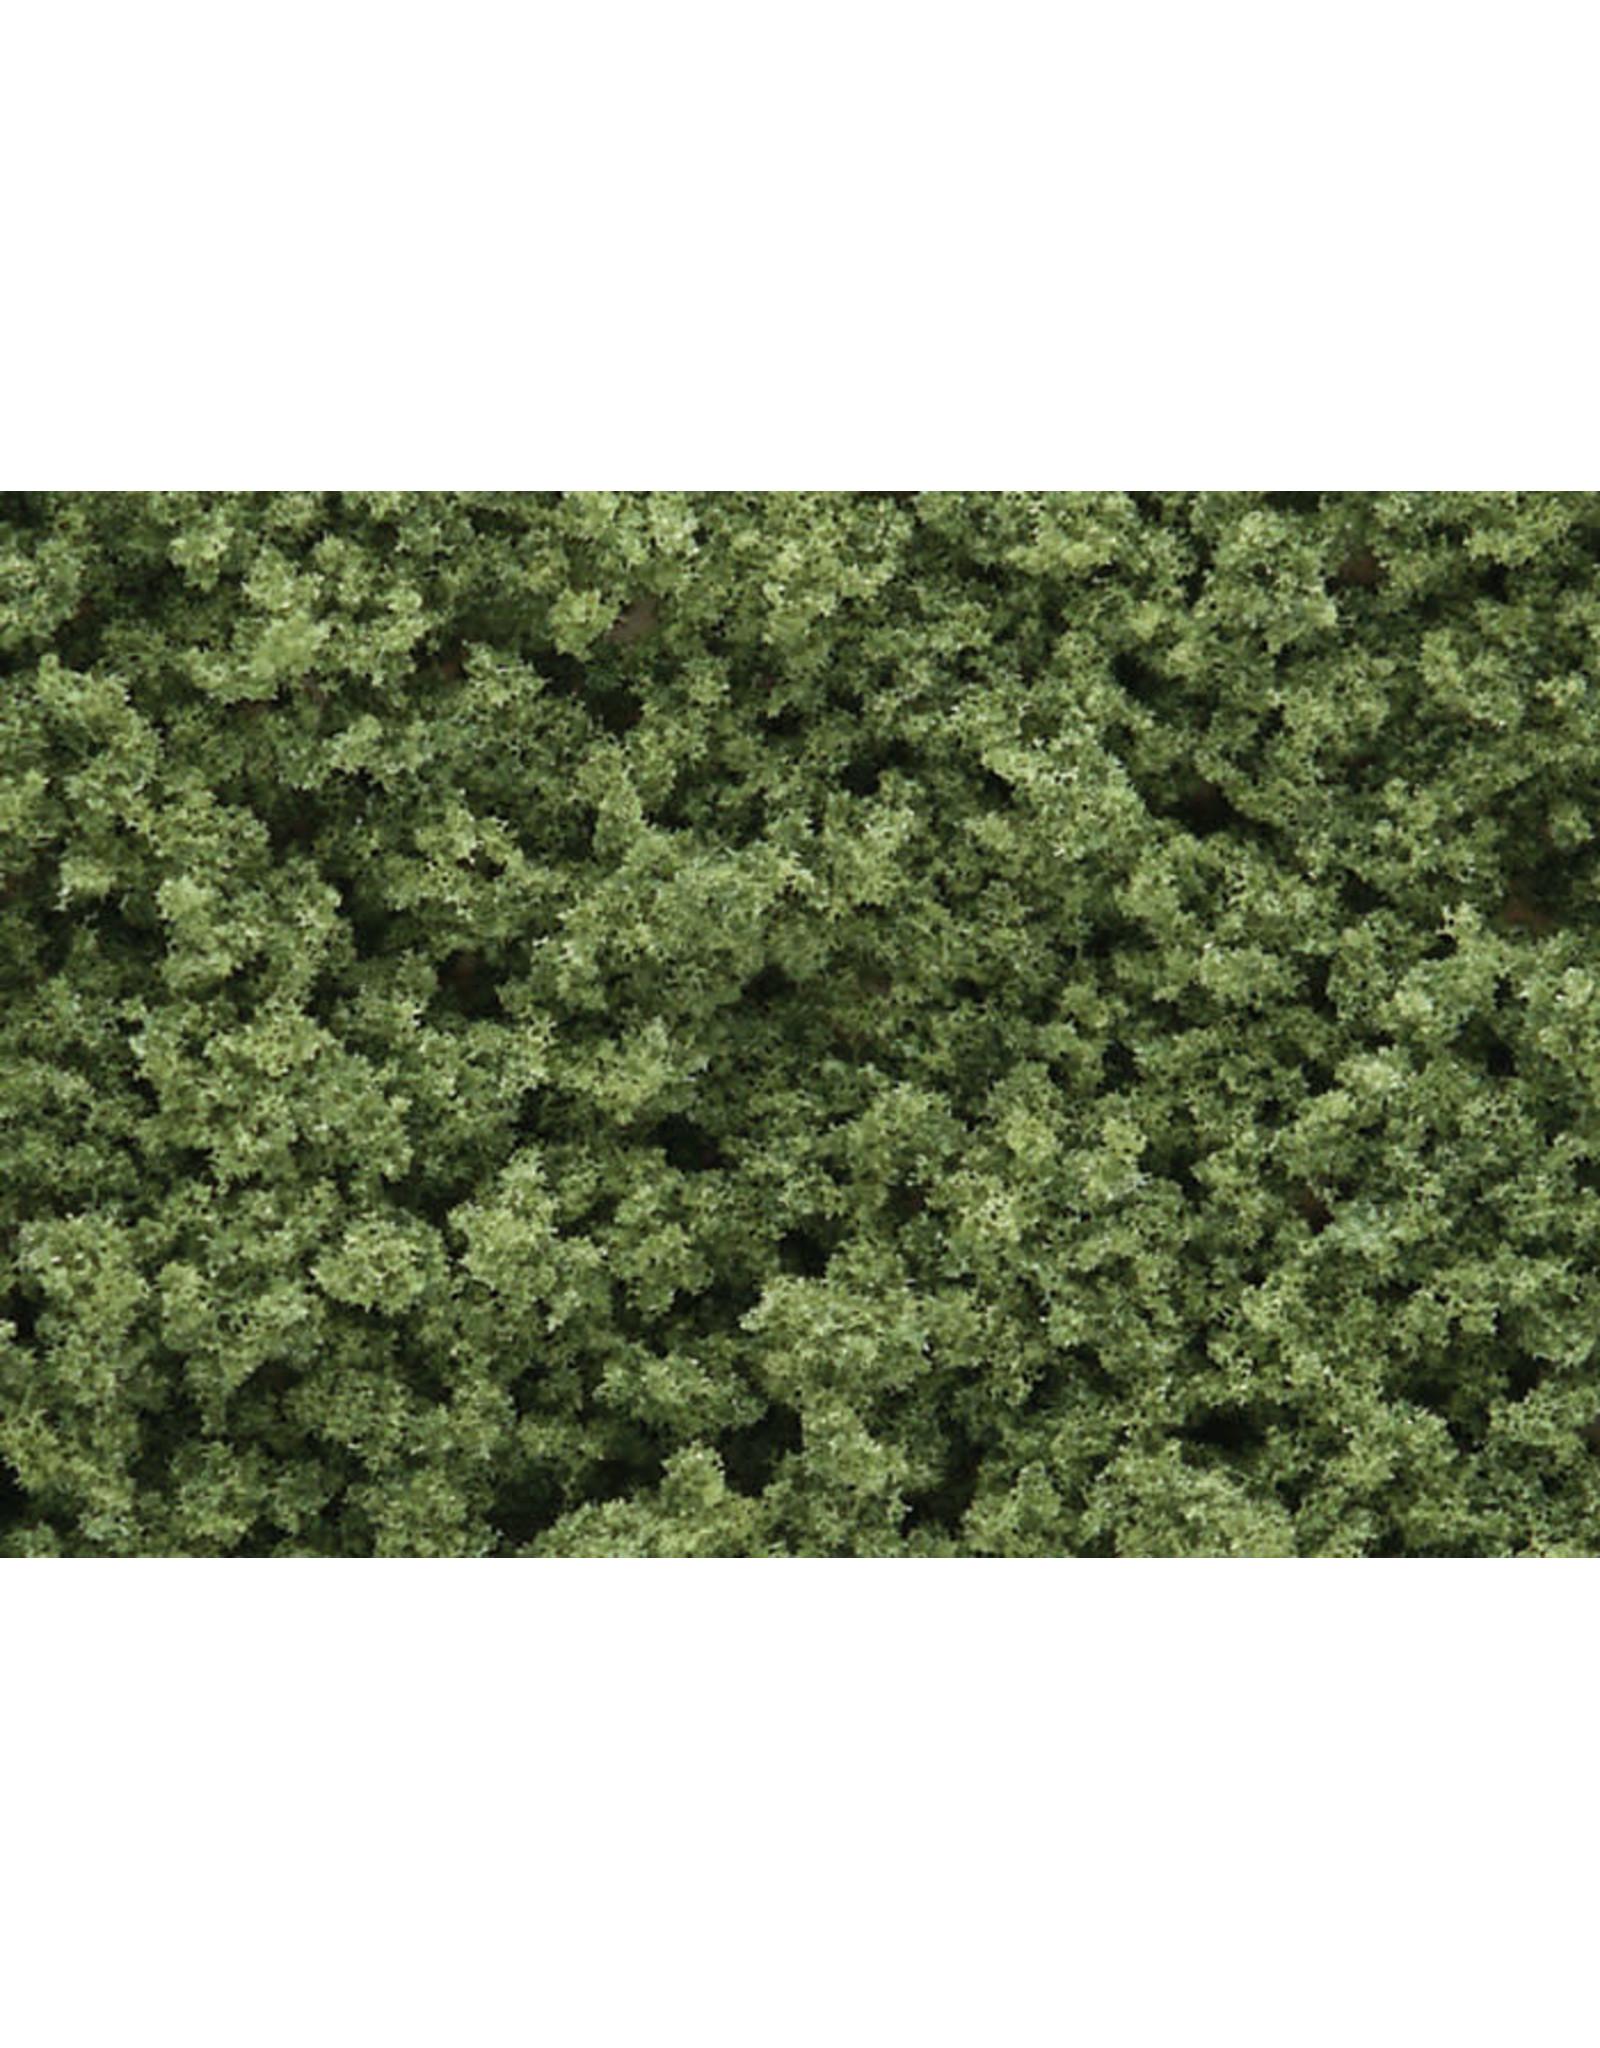 Woodland Scenics Underbrush Light Green FC1635